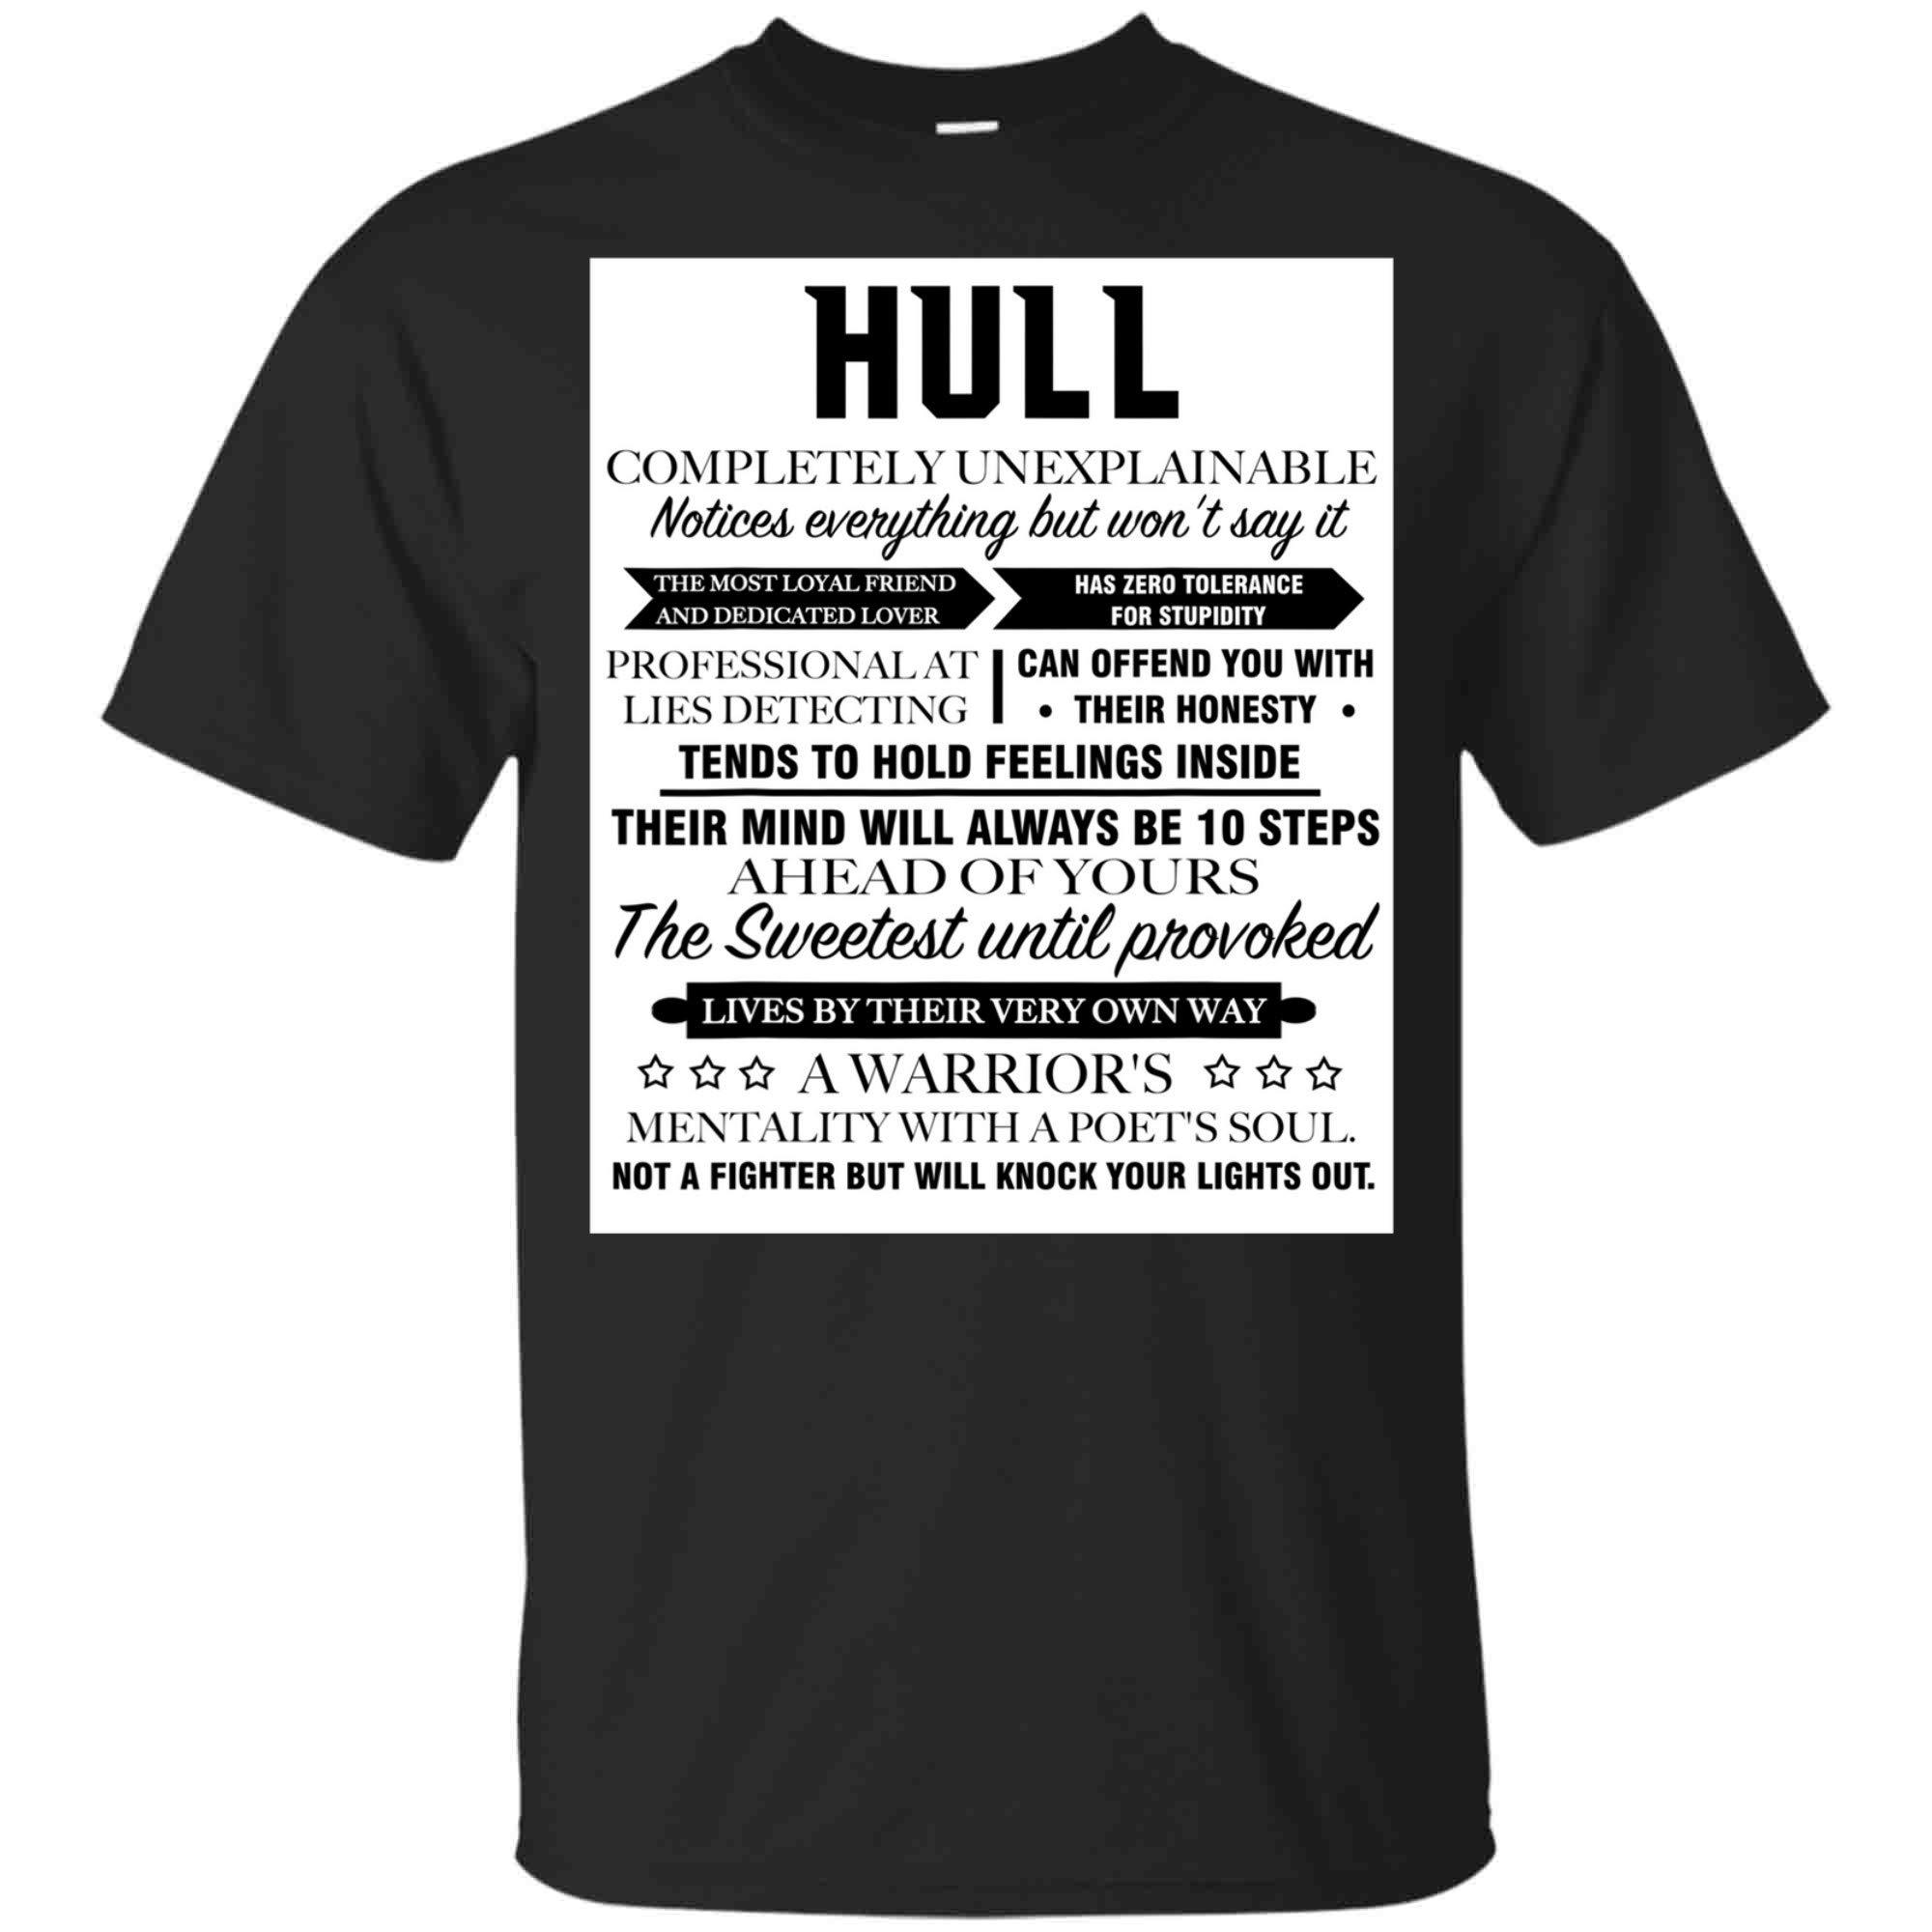 Hull Completely Unexplainable Front Print Unisex Blackl Shirts